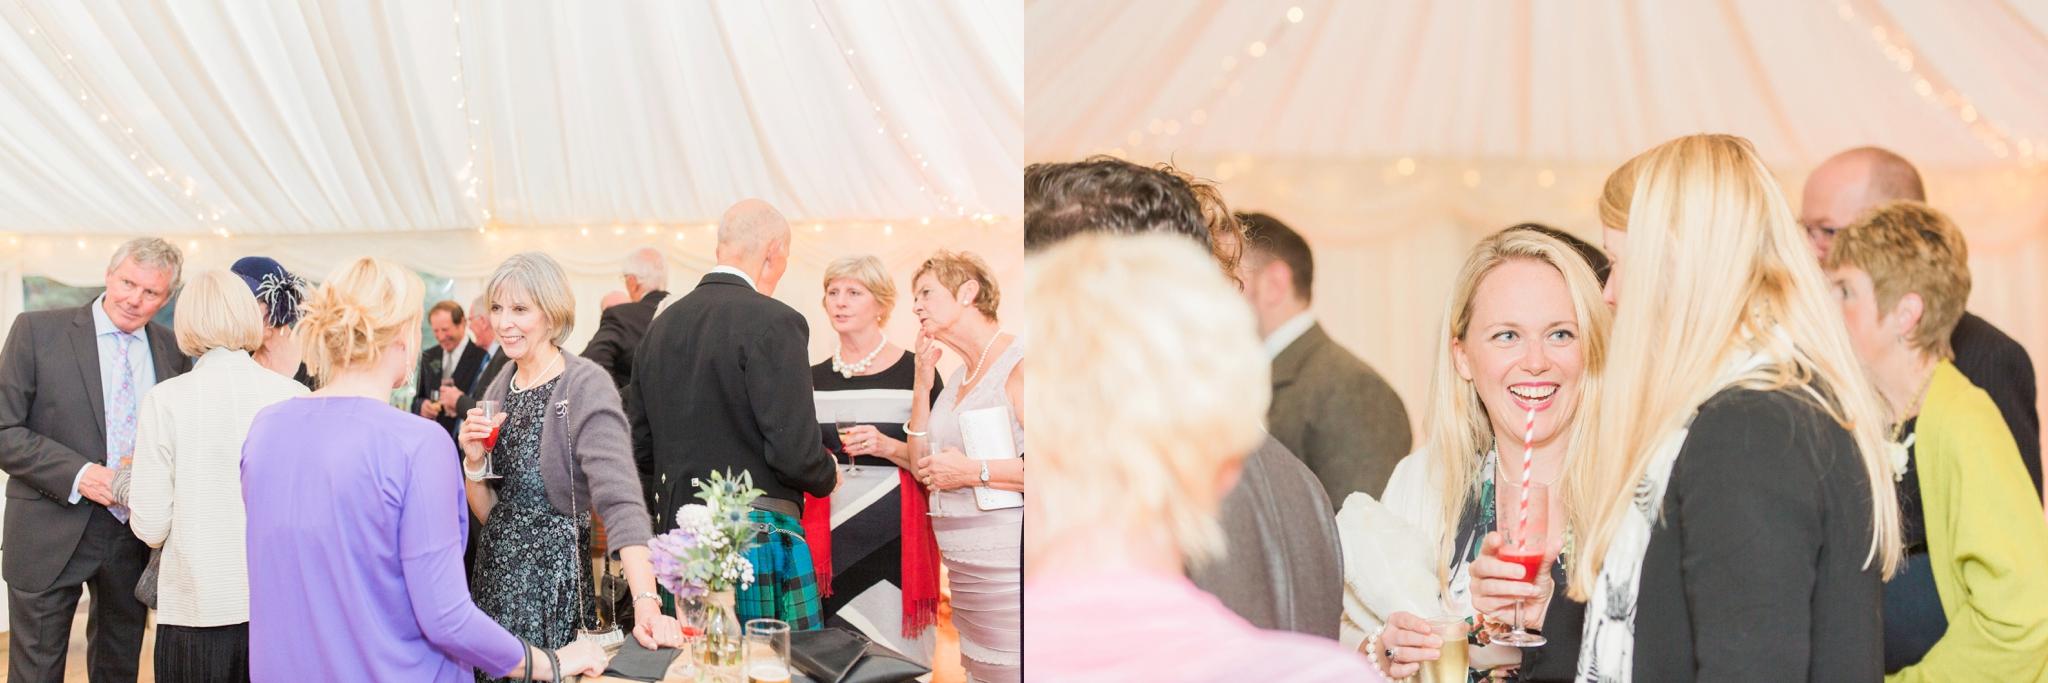 Suzanne_li_photography_kirknewton_wedding_0050.jpg